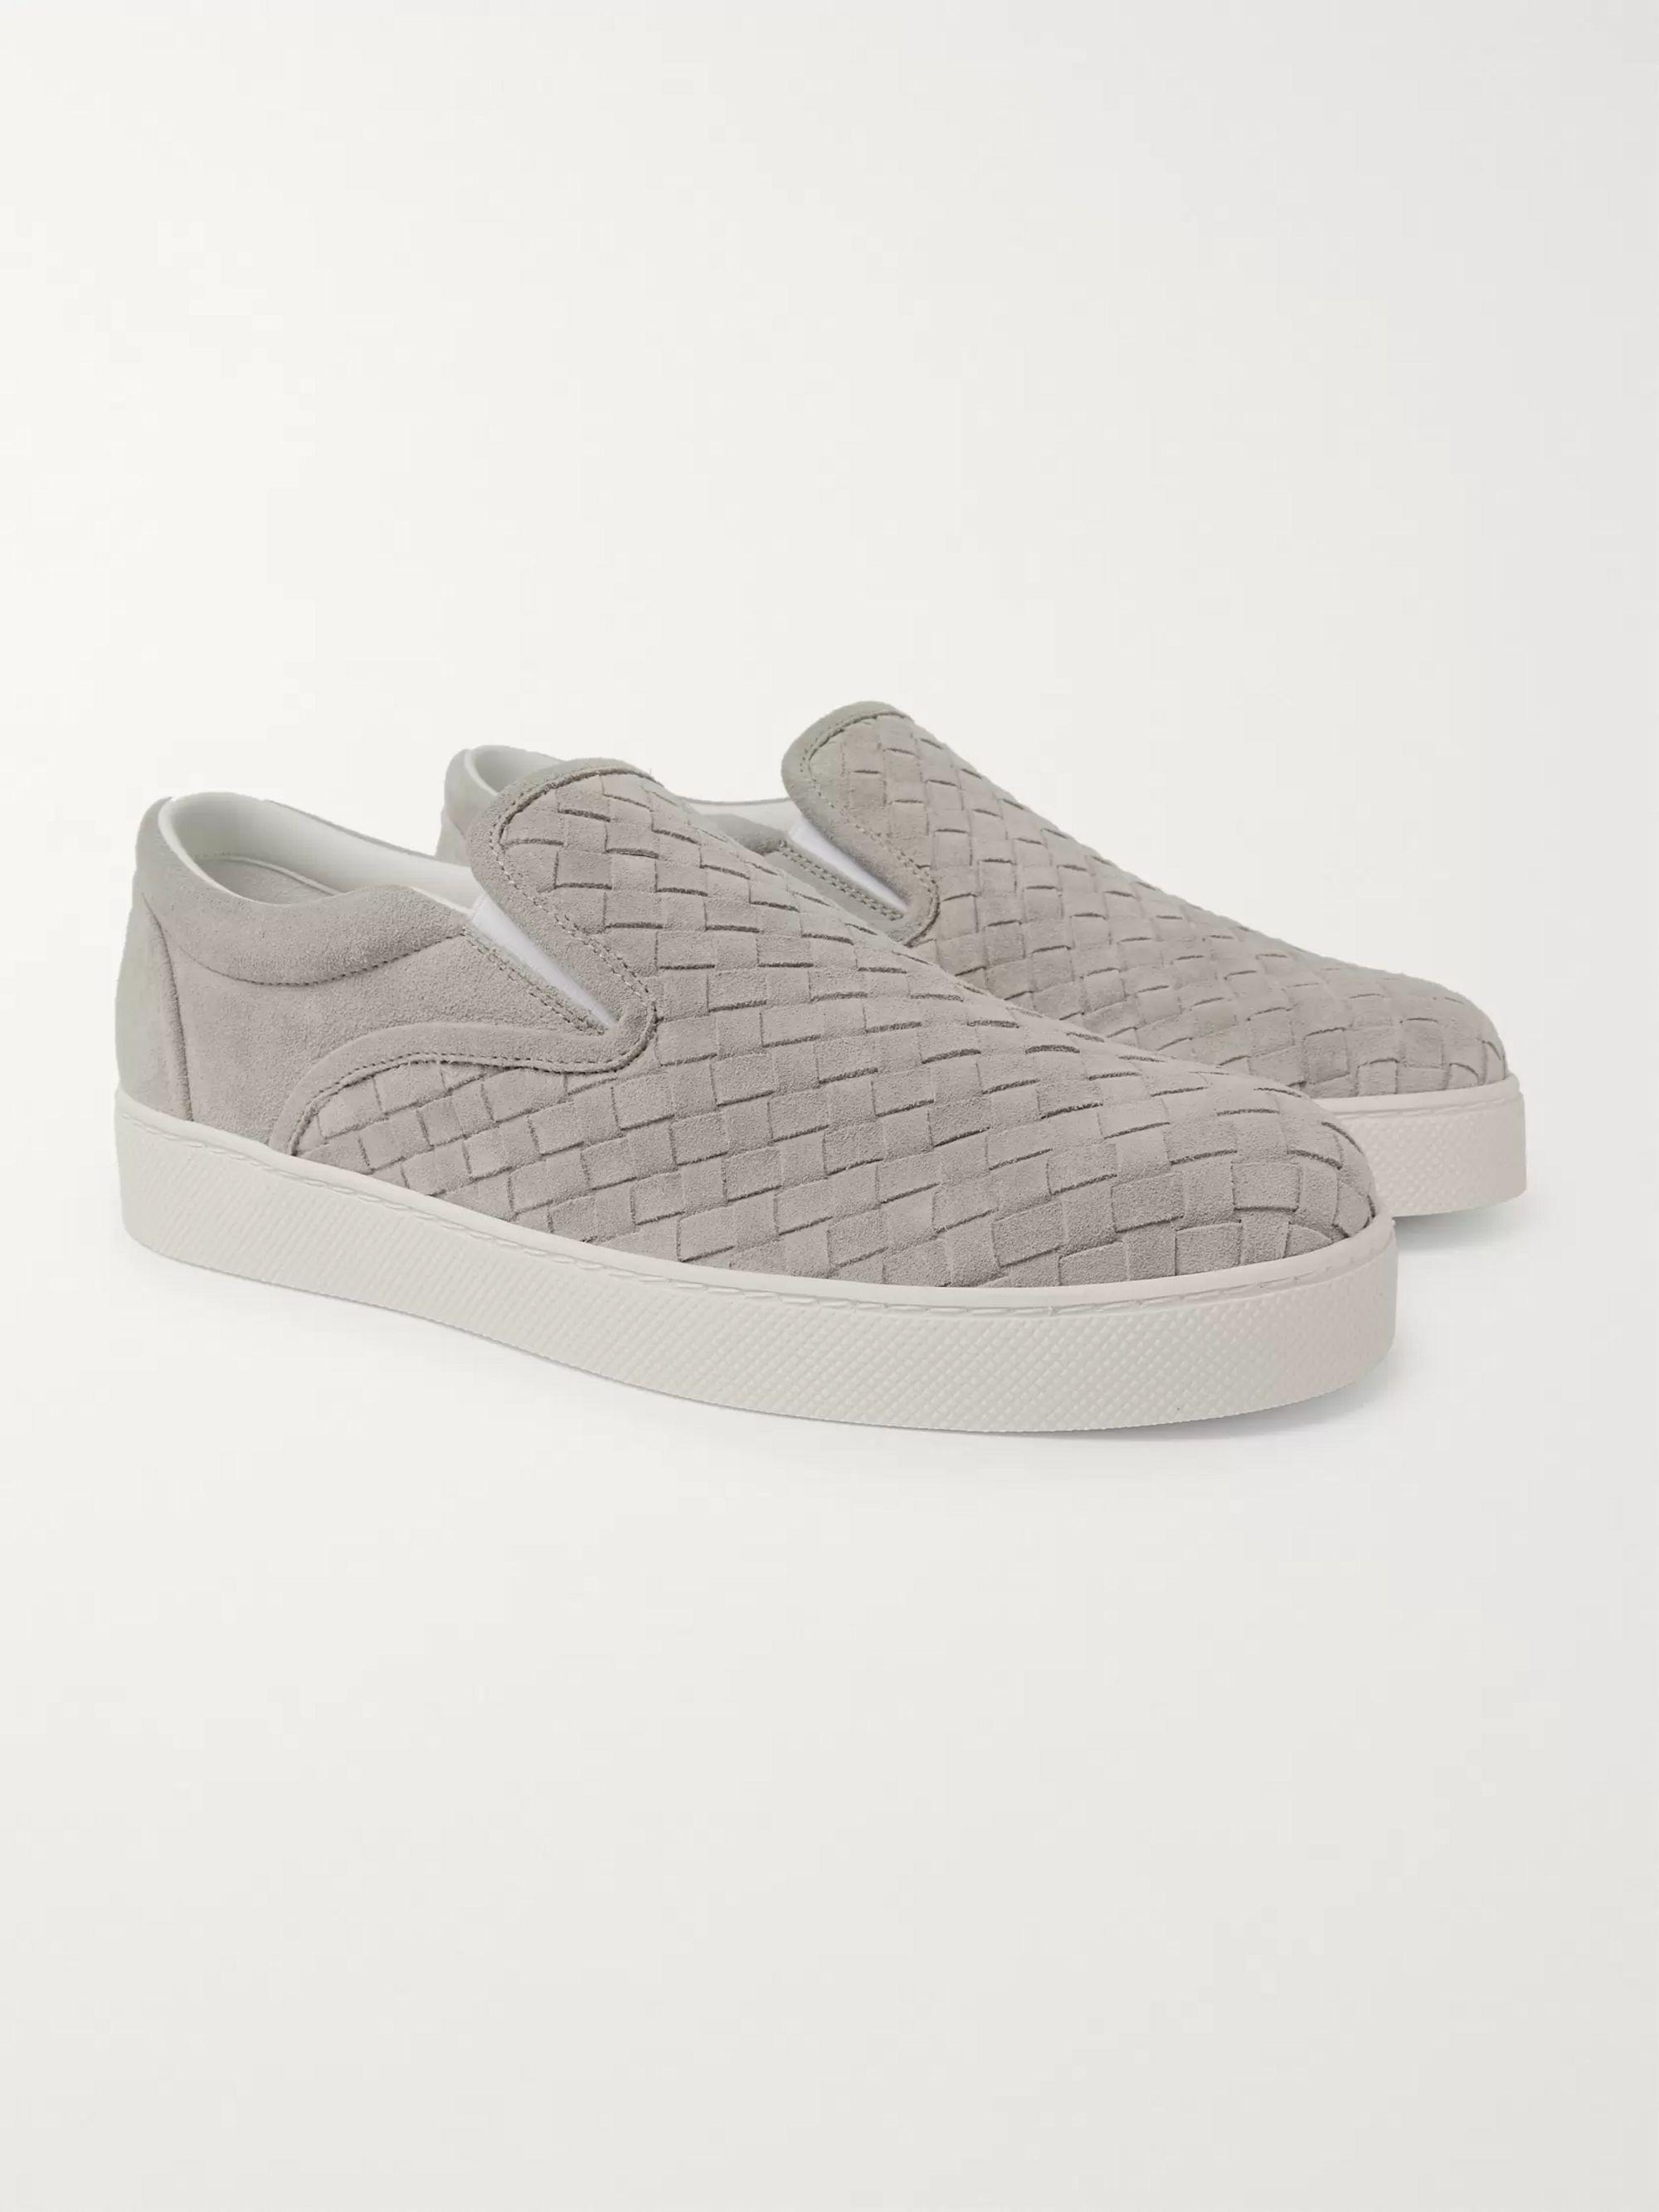 Light gray Intrecciato Suede Slip-On